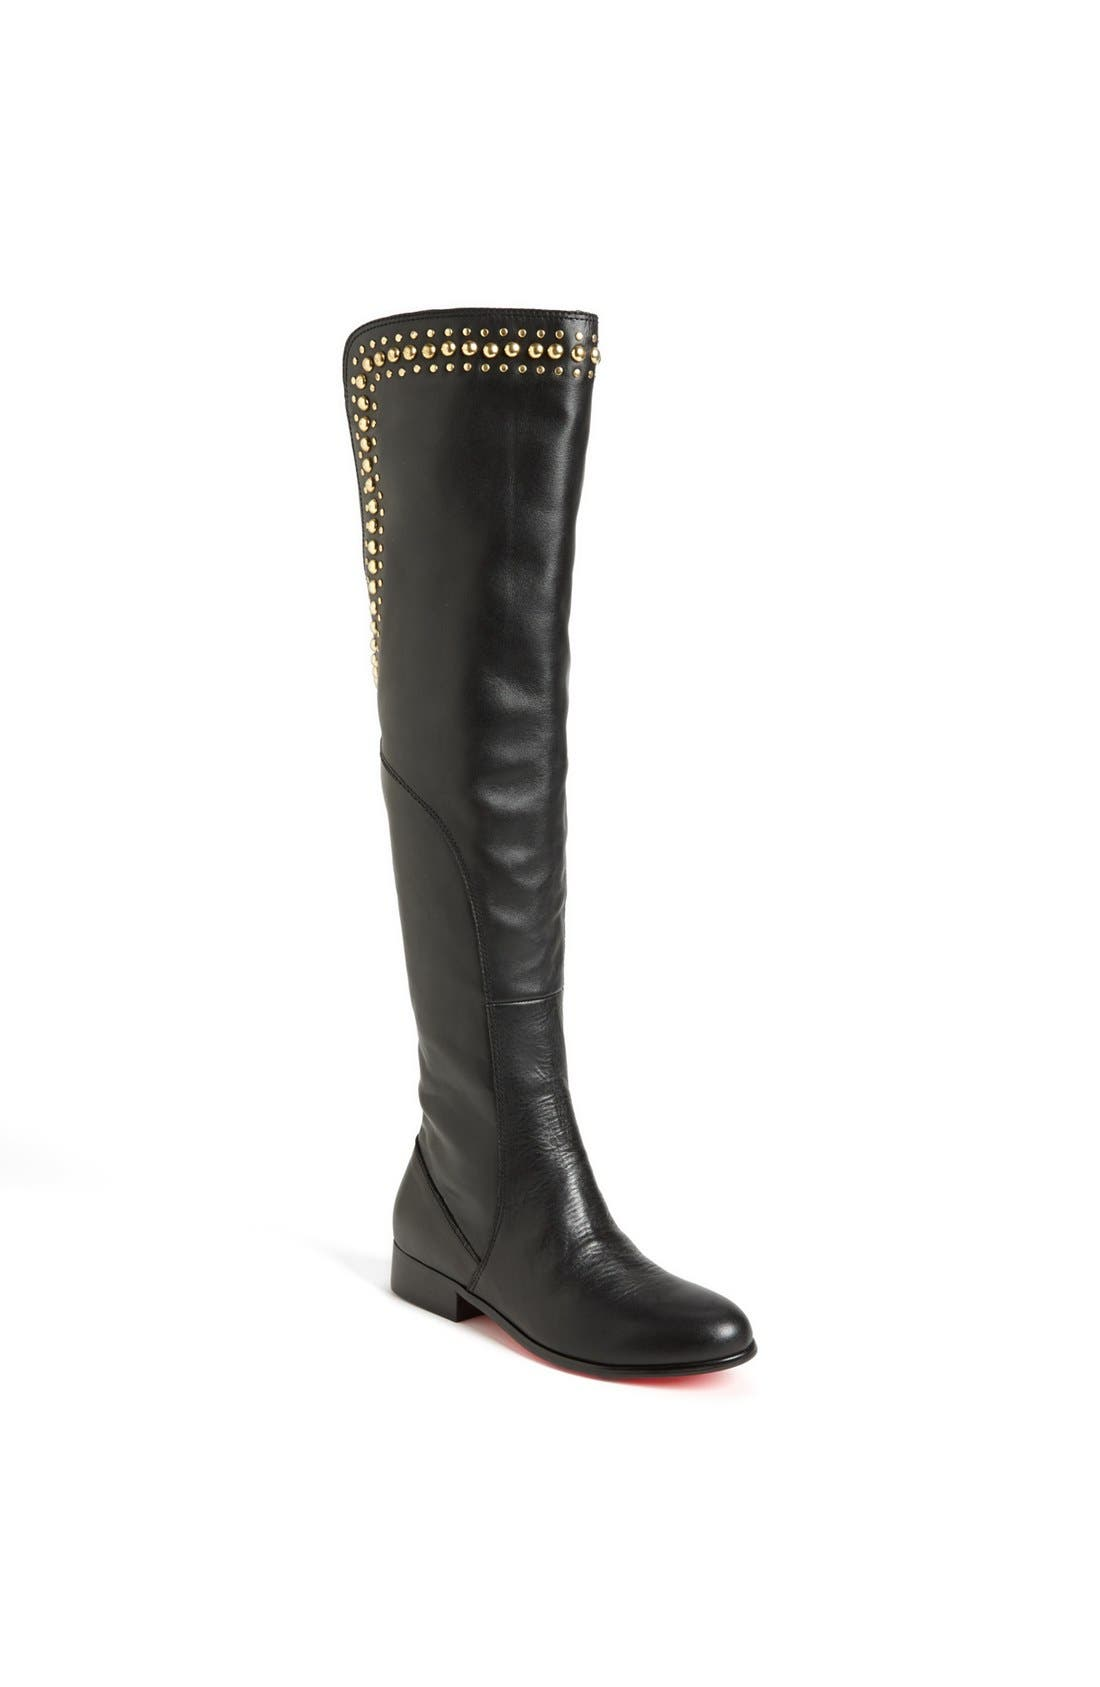 Alternate Image 1 Selected - Betsey Johnson 'Shanah' Over the Knee Boot